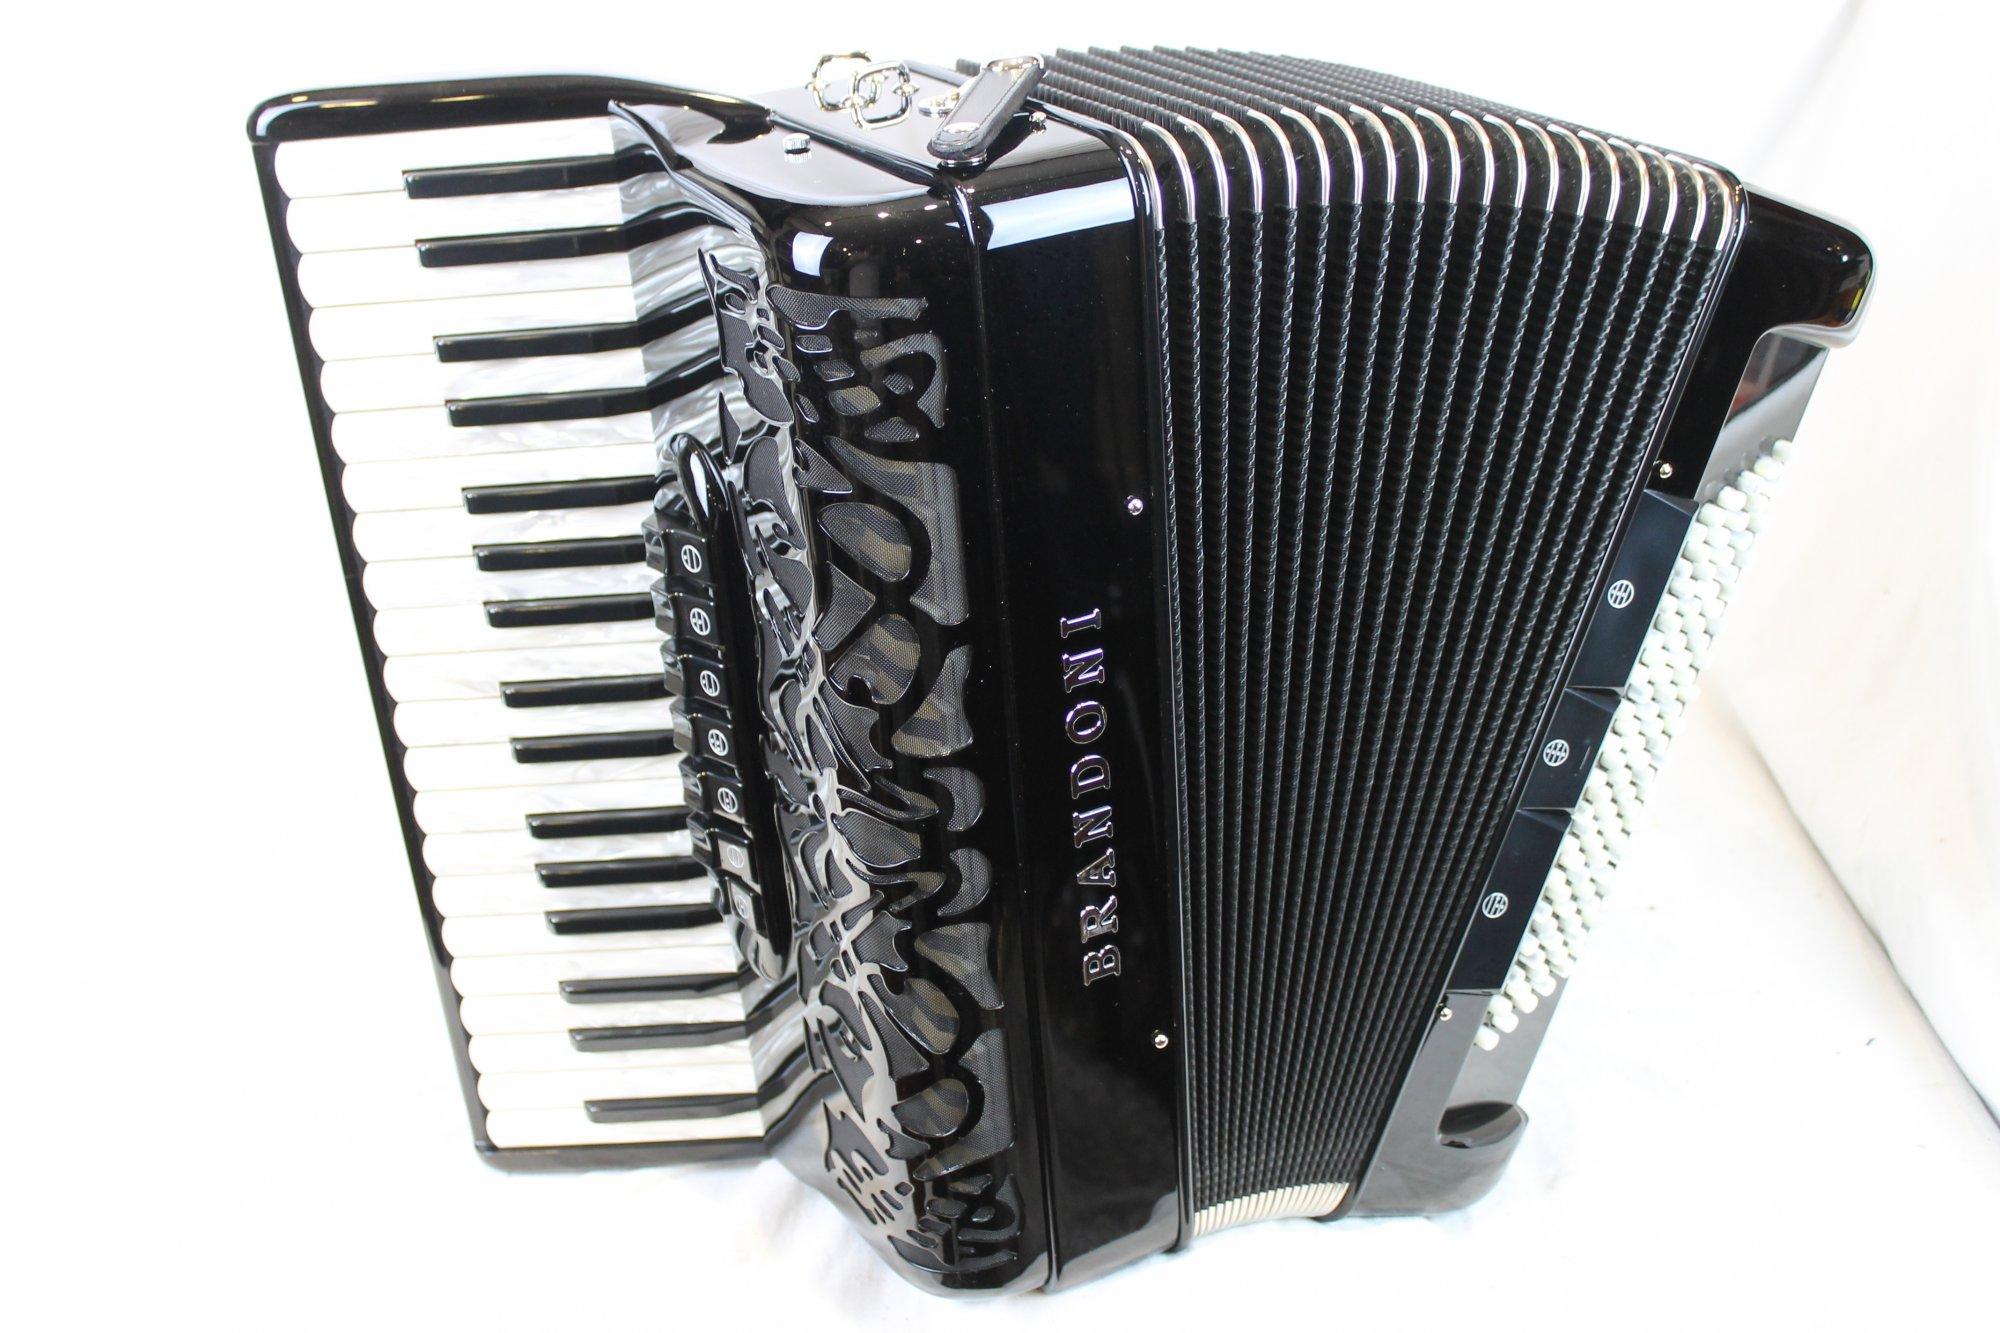 NEW Black Brandoni 75 Liberty Piano Accordion LMM 37 96